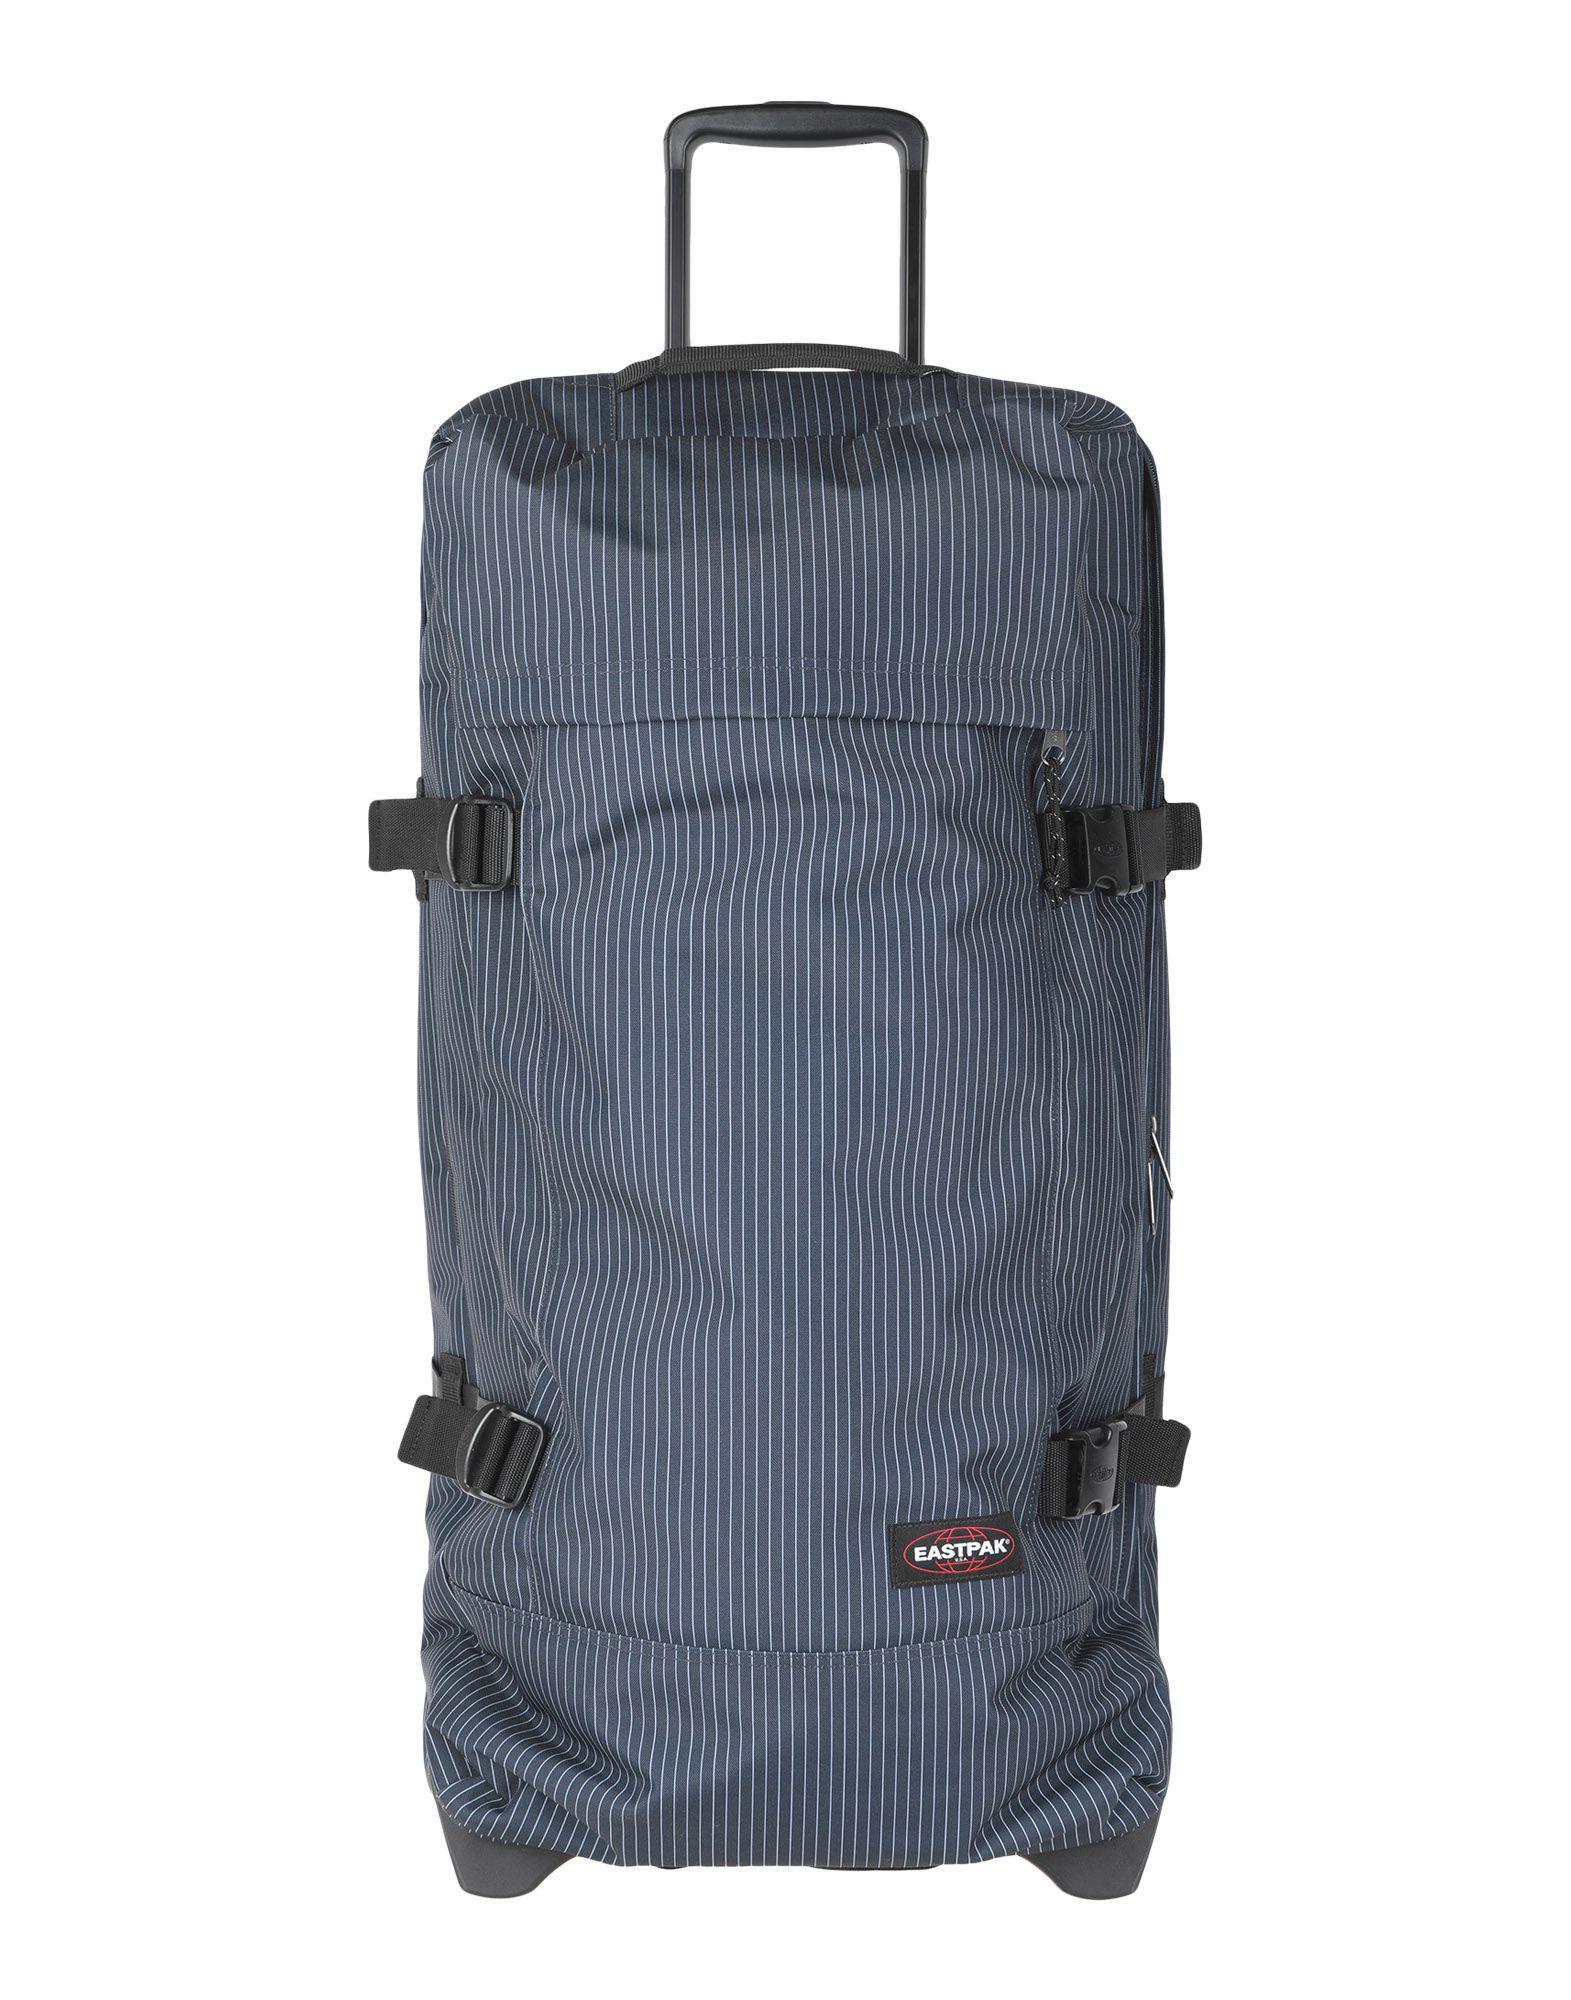 EASTPAK Чемодан/сумка на колесиках чемодан на колесиках пчела trunki чемодан на колесиках пчела